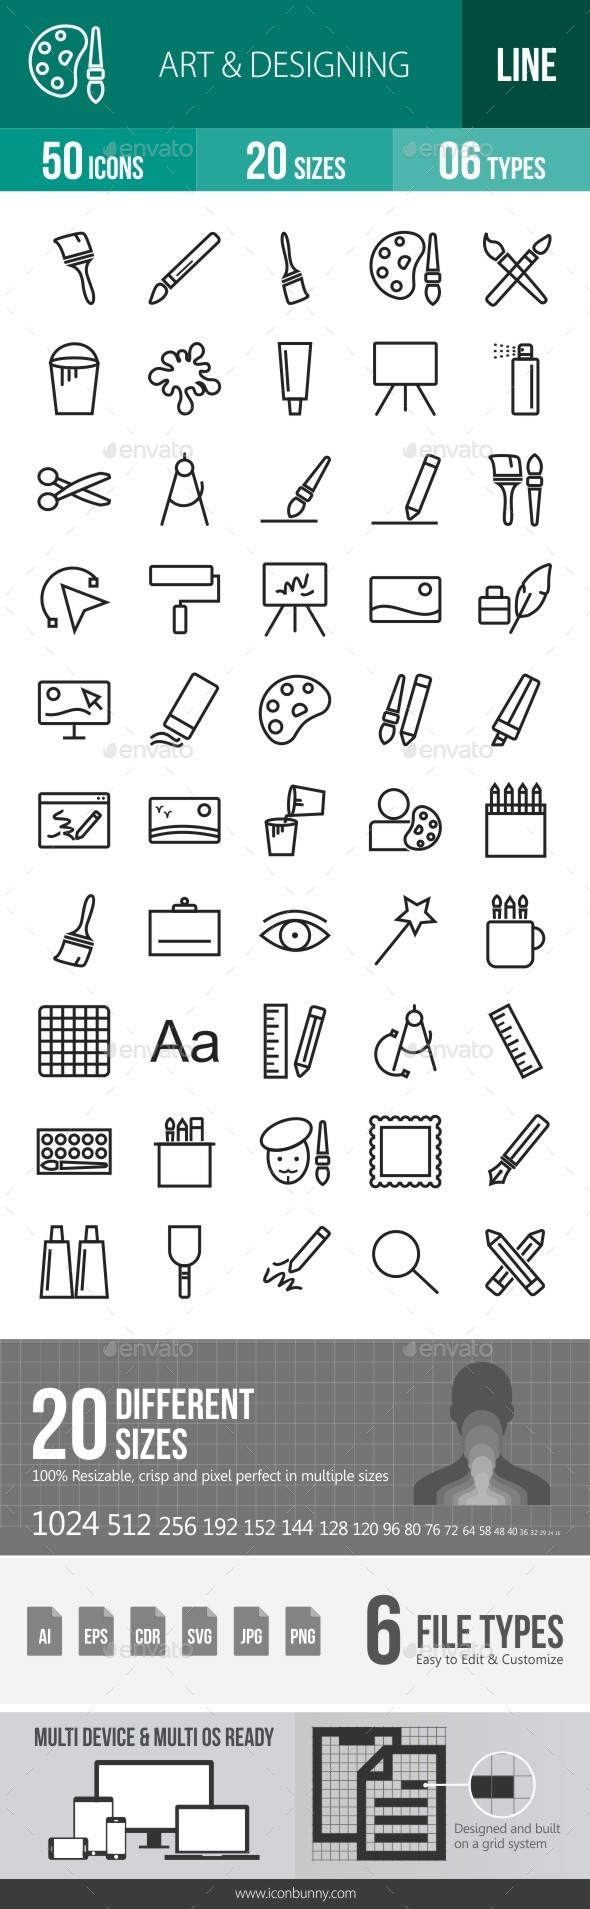 Art & Designing Line Icons - Icons